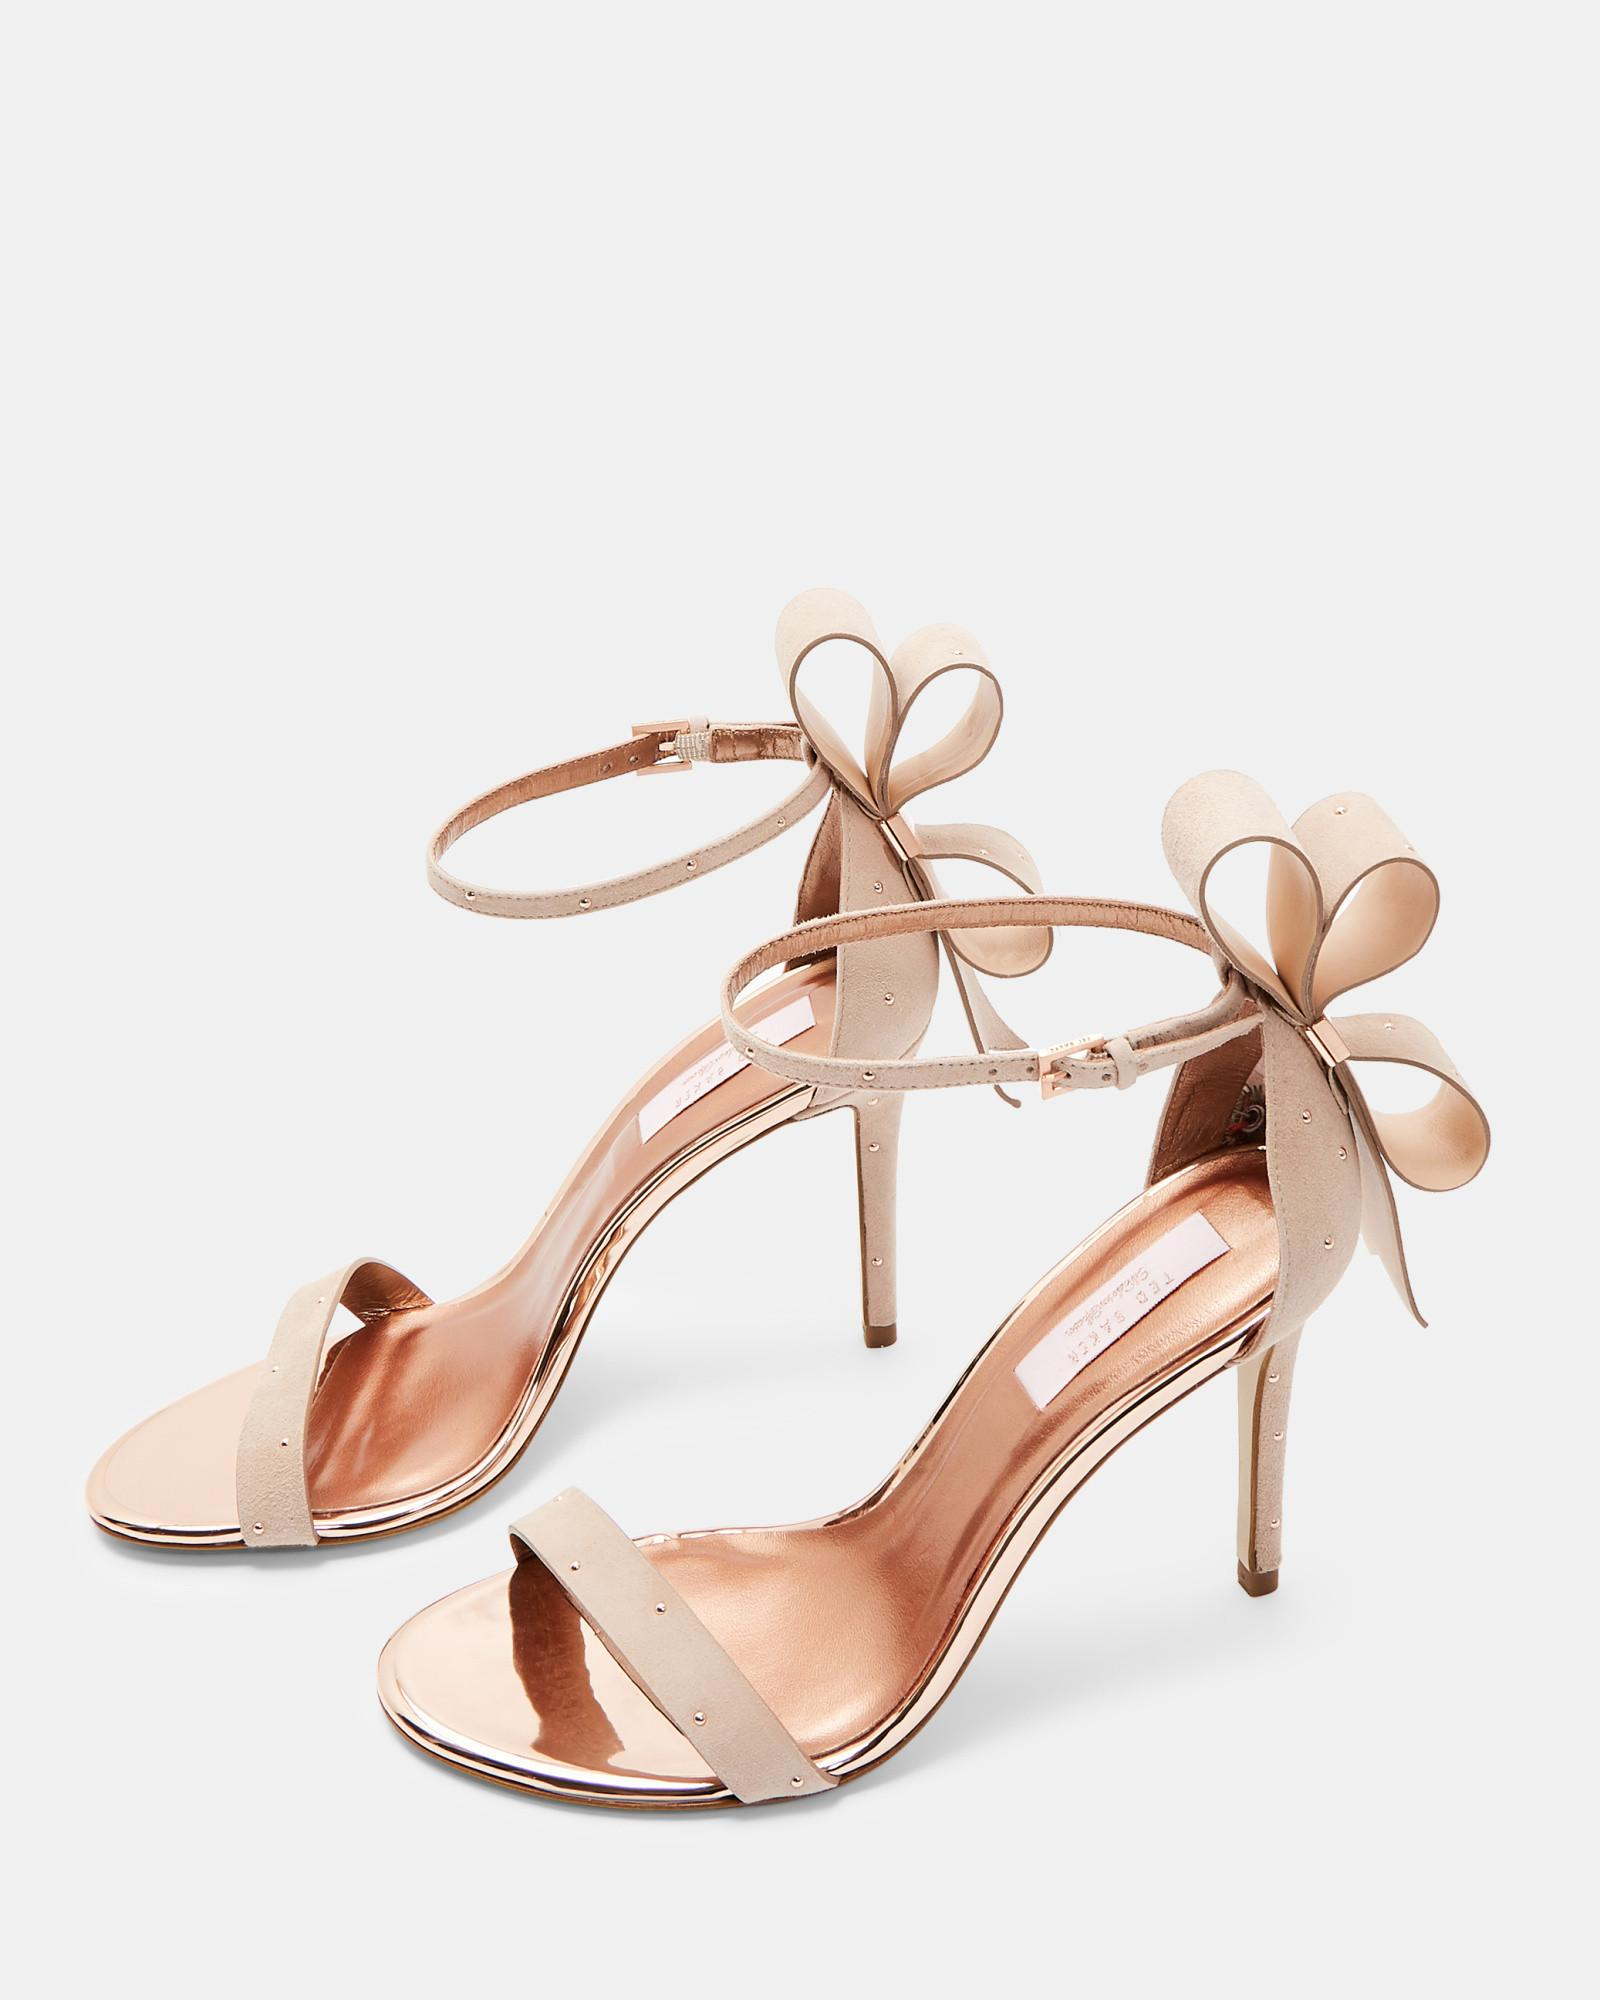 df34b764408 Ted Baker. Women s Oversized Bow Sandals